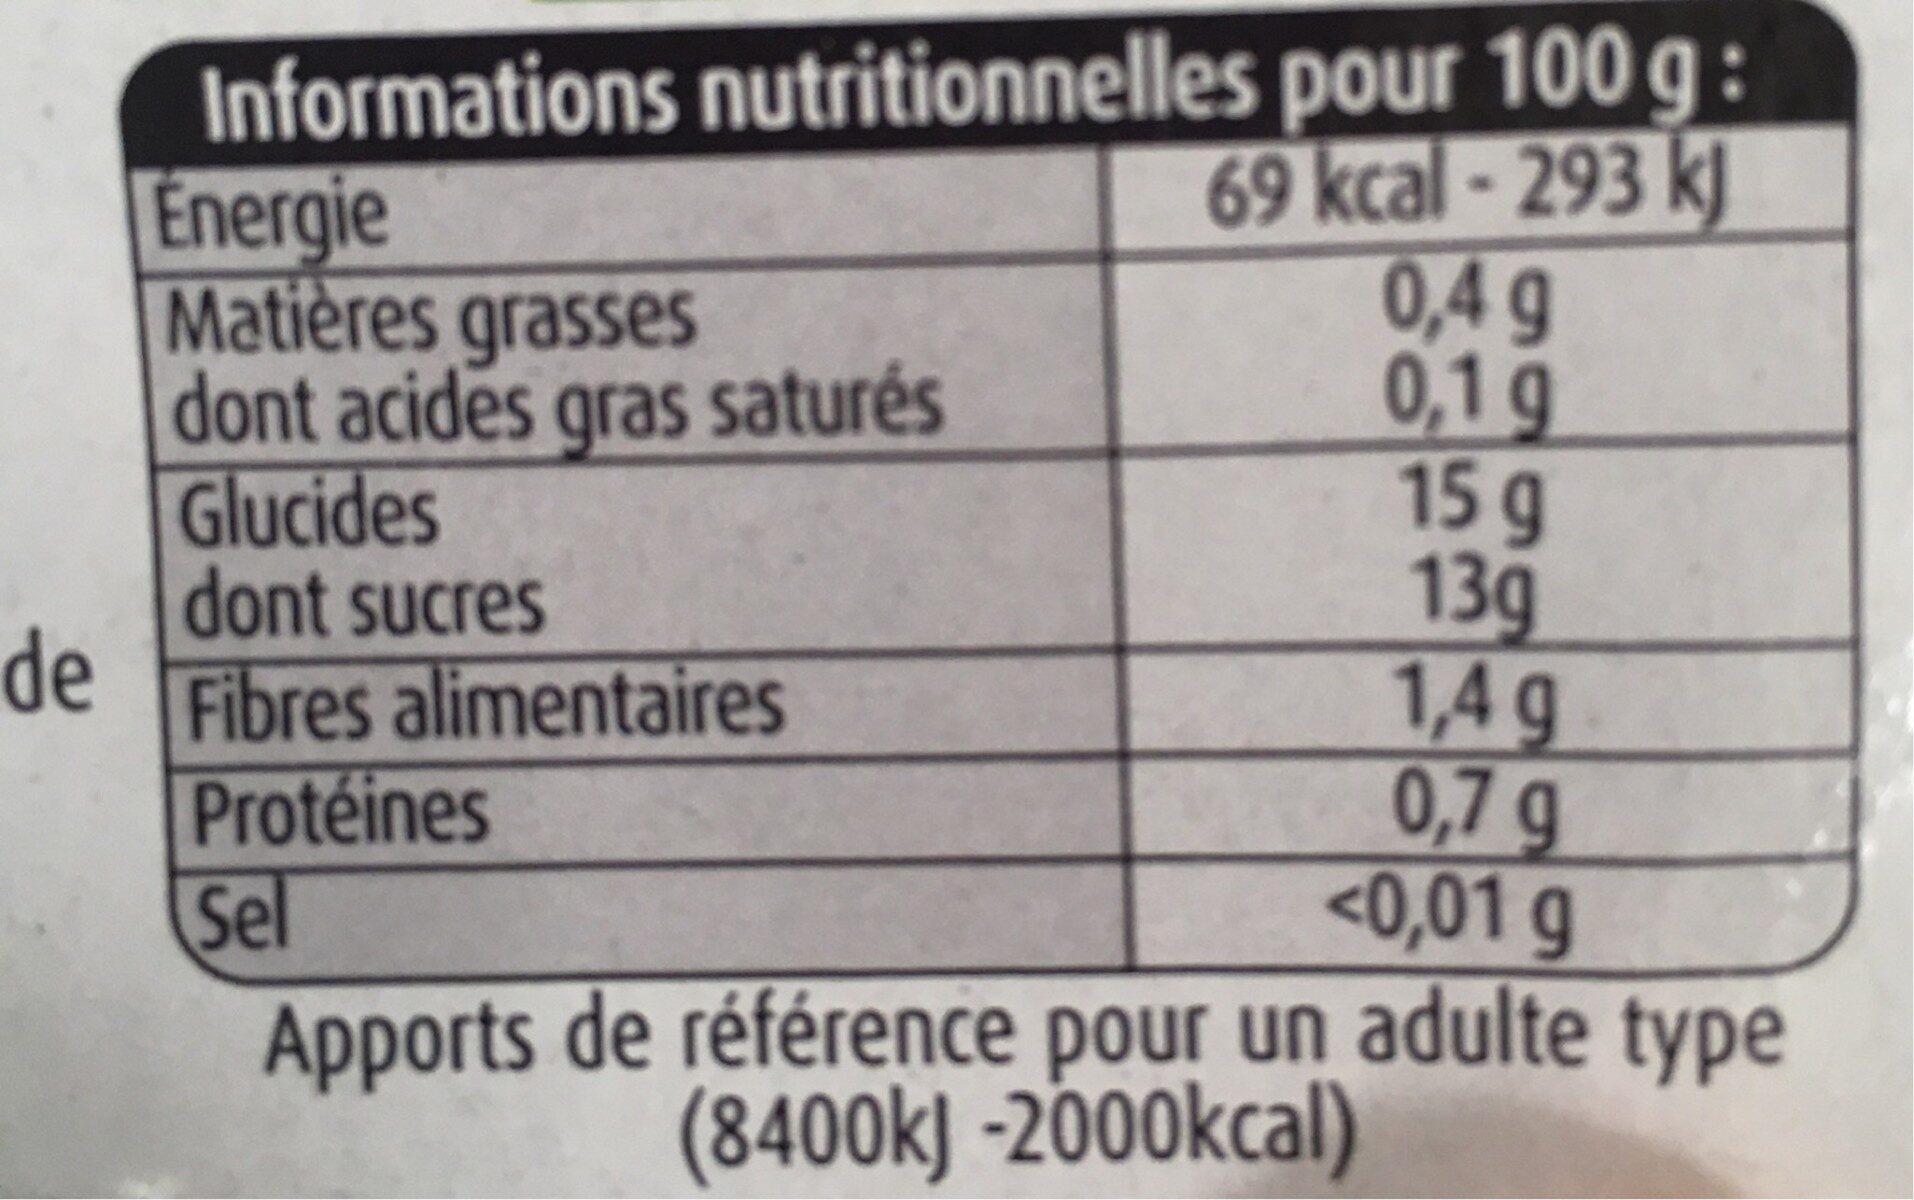 Pommes bananes vanille - Informations nutritionnelles - fr